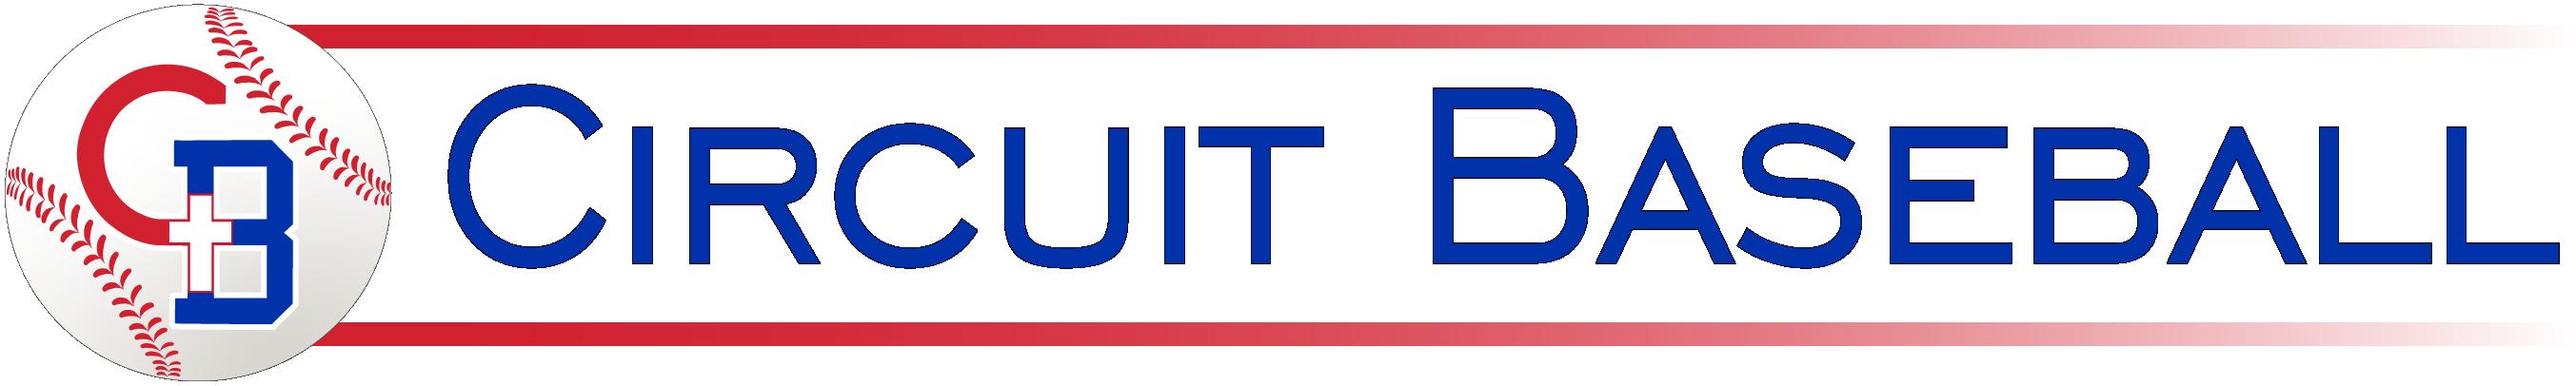 Circuit Baseball Title Logo